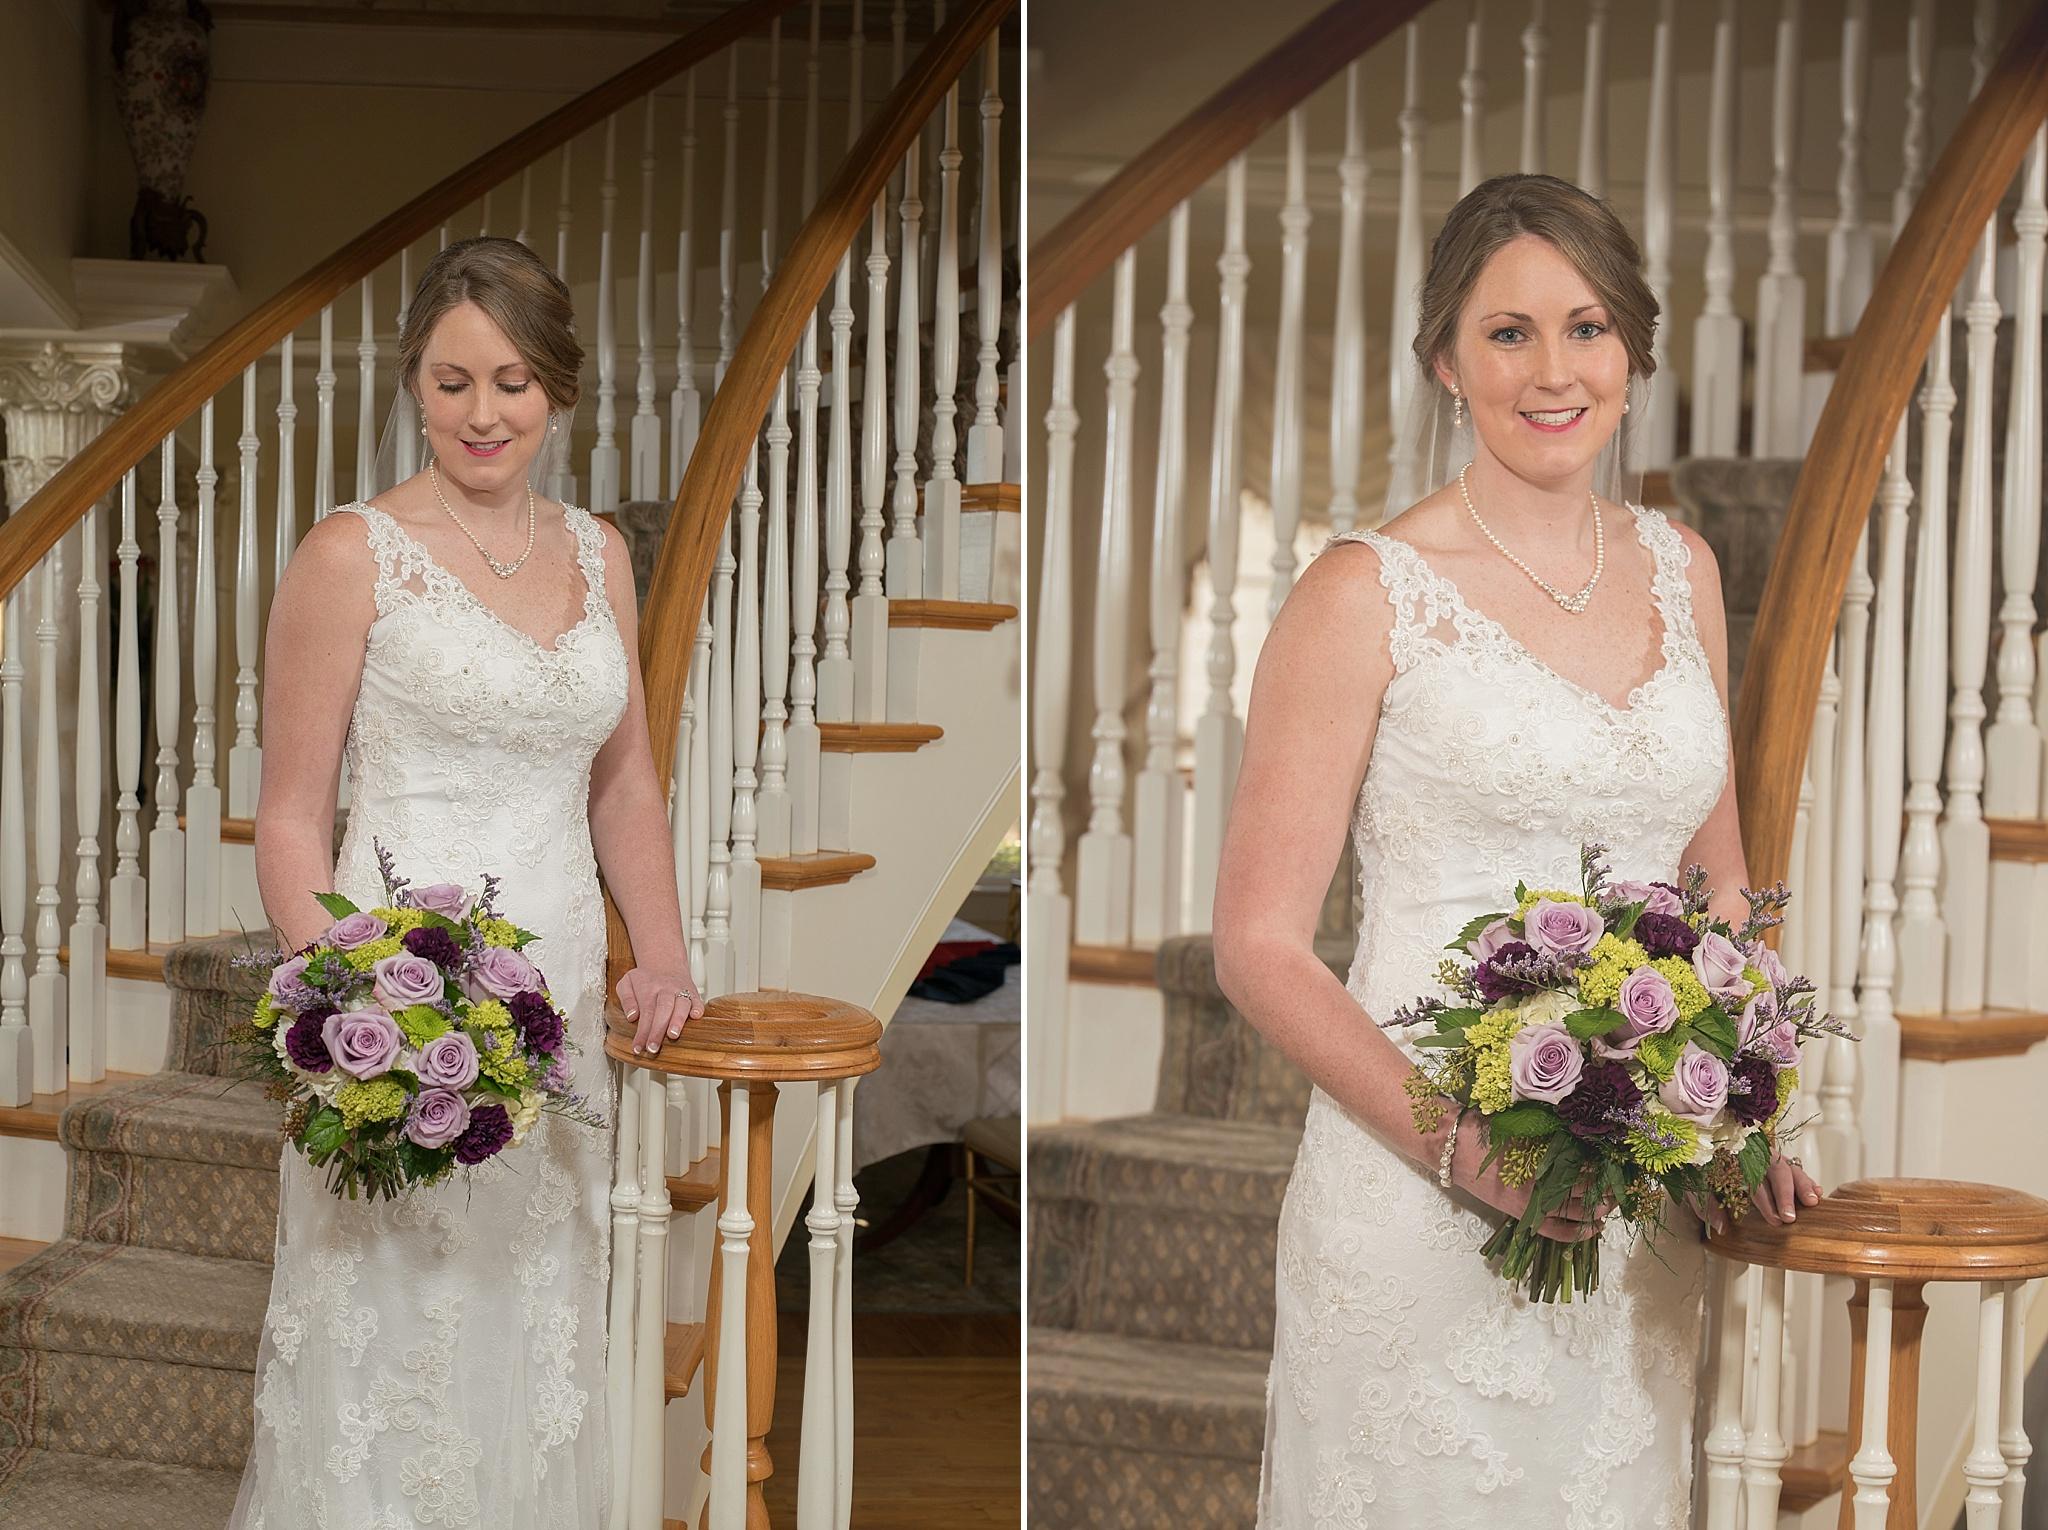 Yankee-Hall-Plantation-Wedding-NC-Photographer-0142.jpg